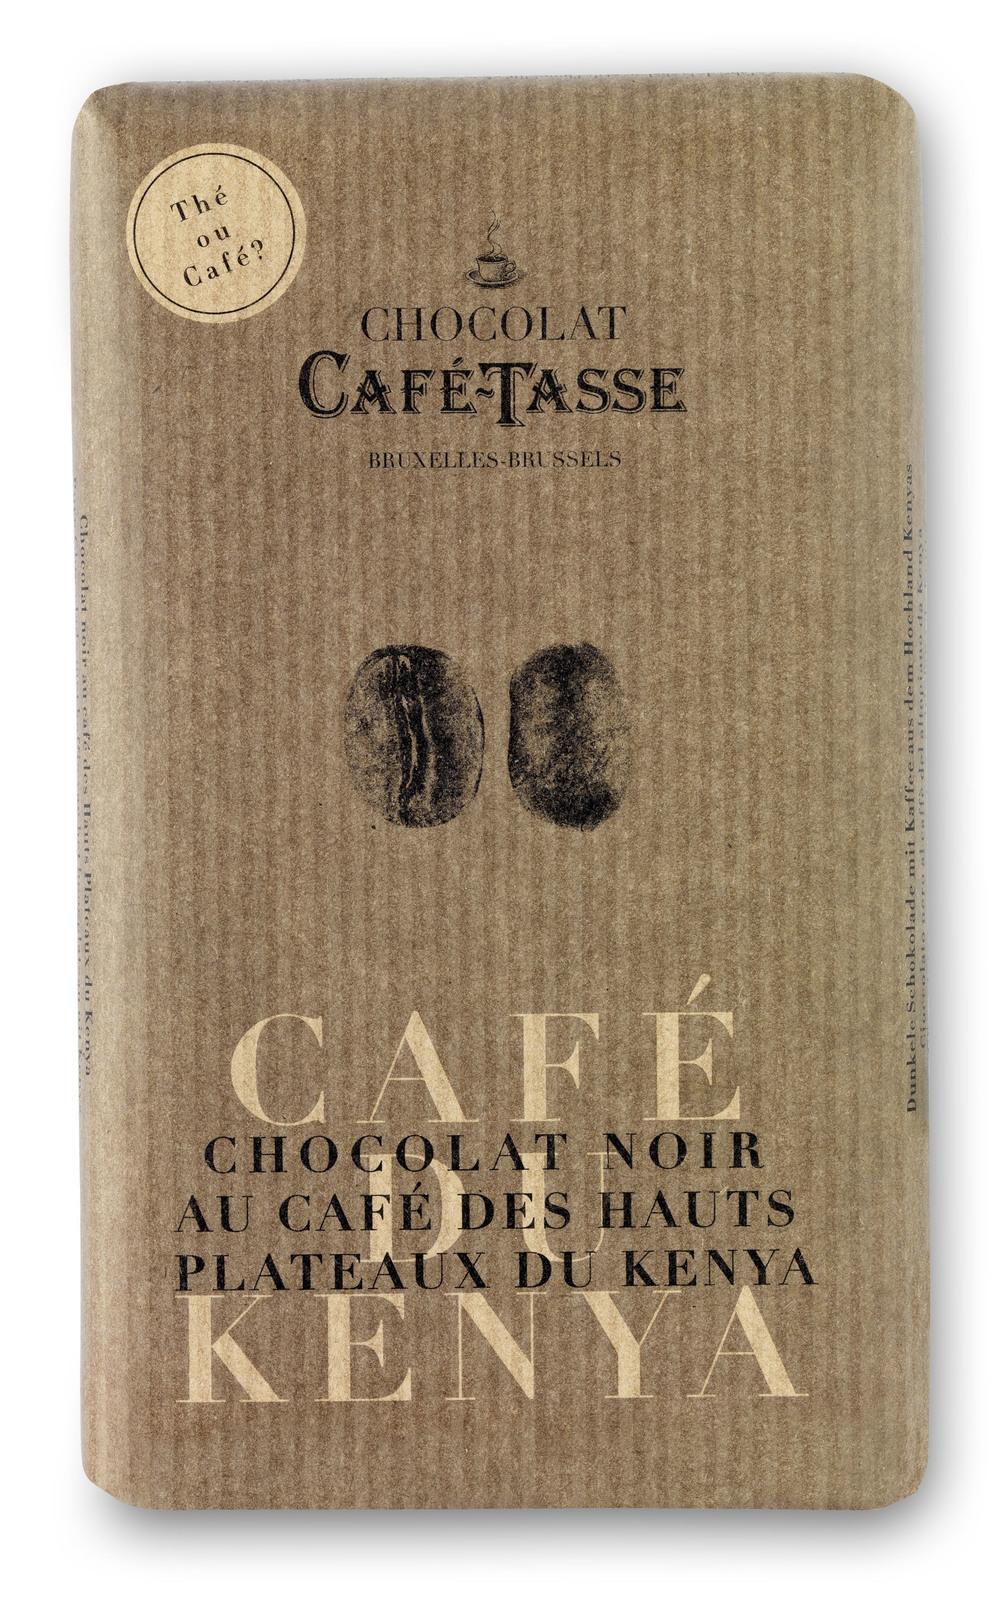 CAFÉ DU KENYA - NOIR & CAFÉ DU KENYA / DARK & COFFEE KENYA TABLETTES / BARS 57% 85G